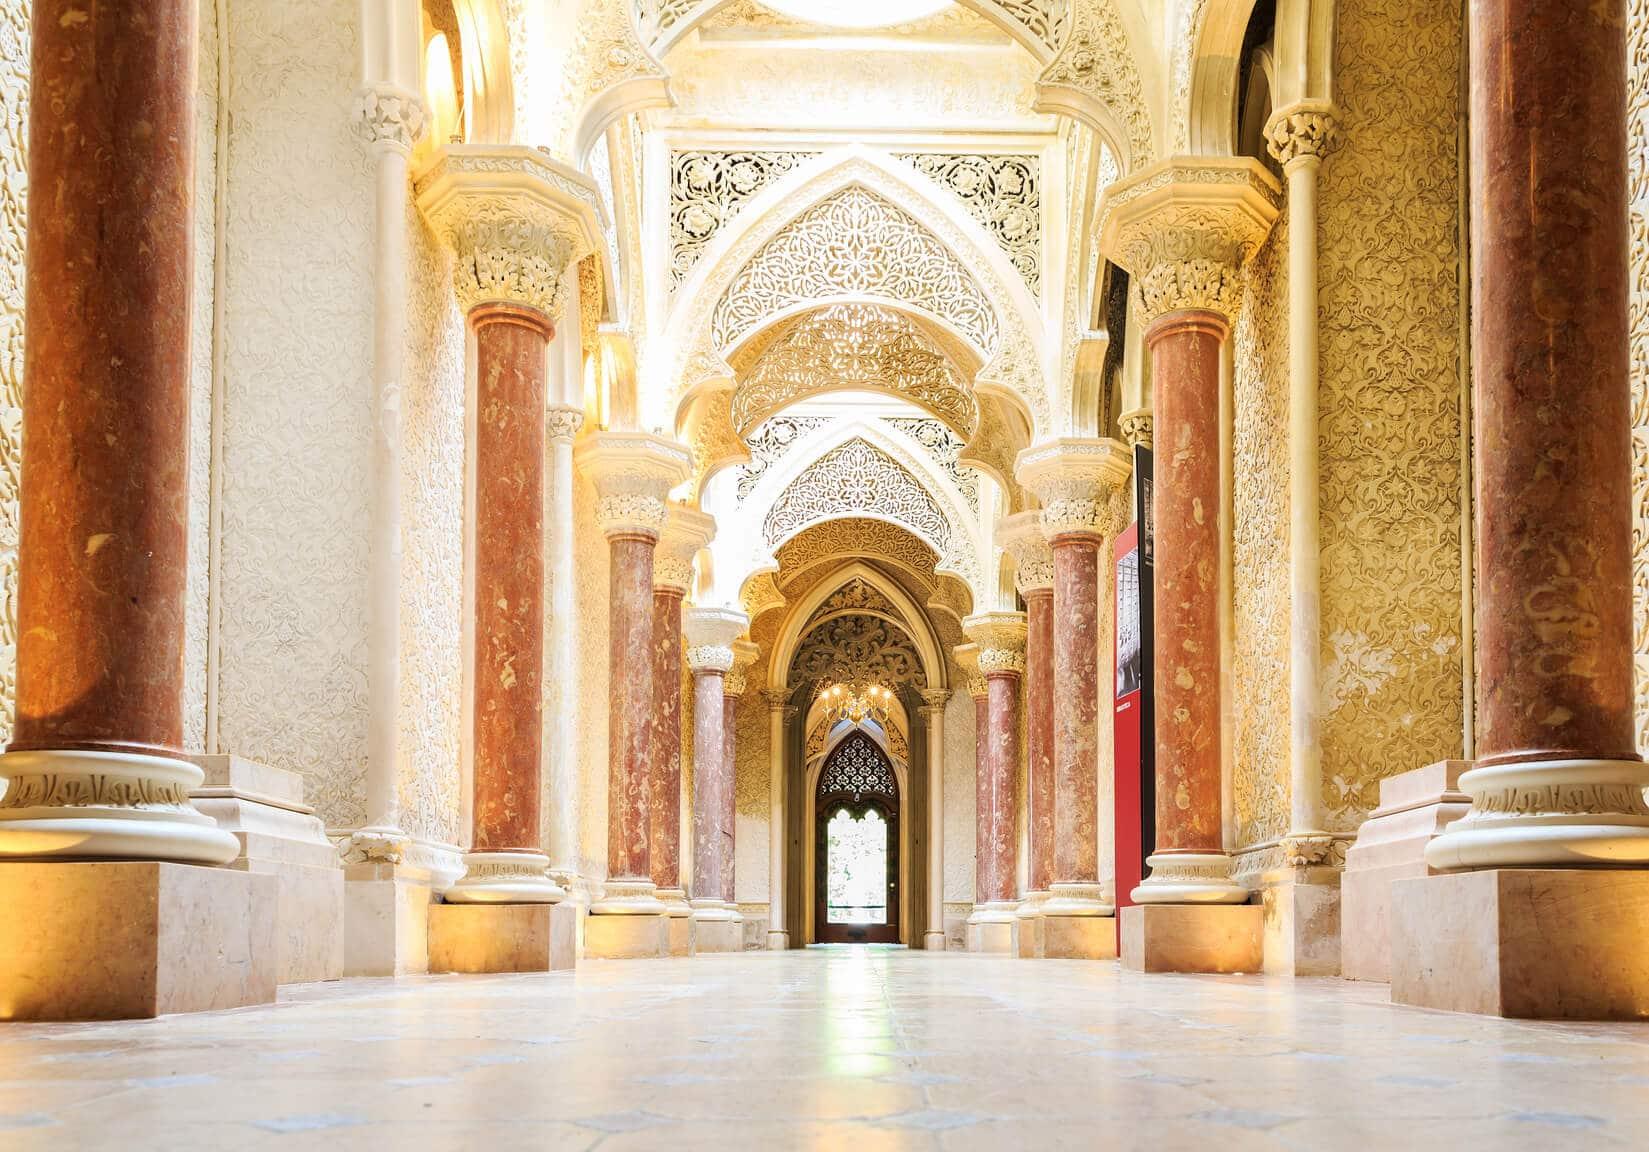 Discover Sintra Castles